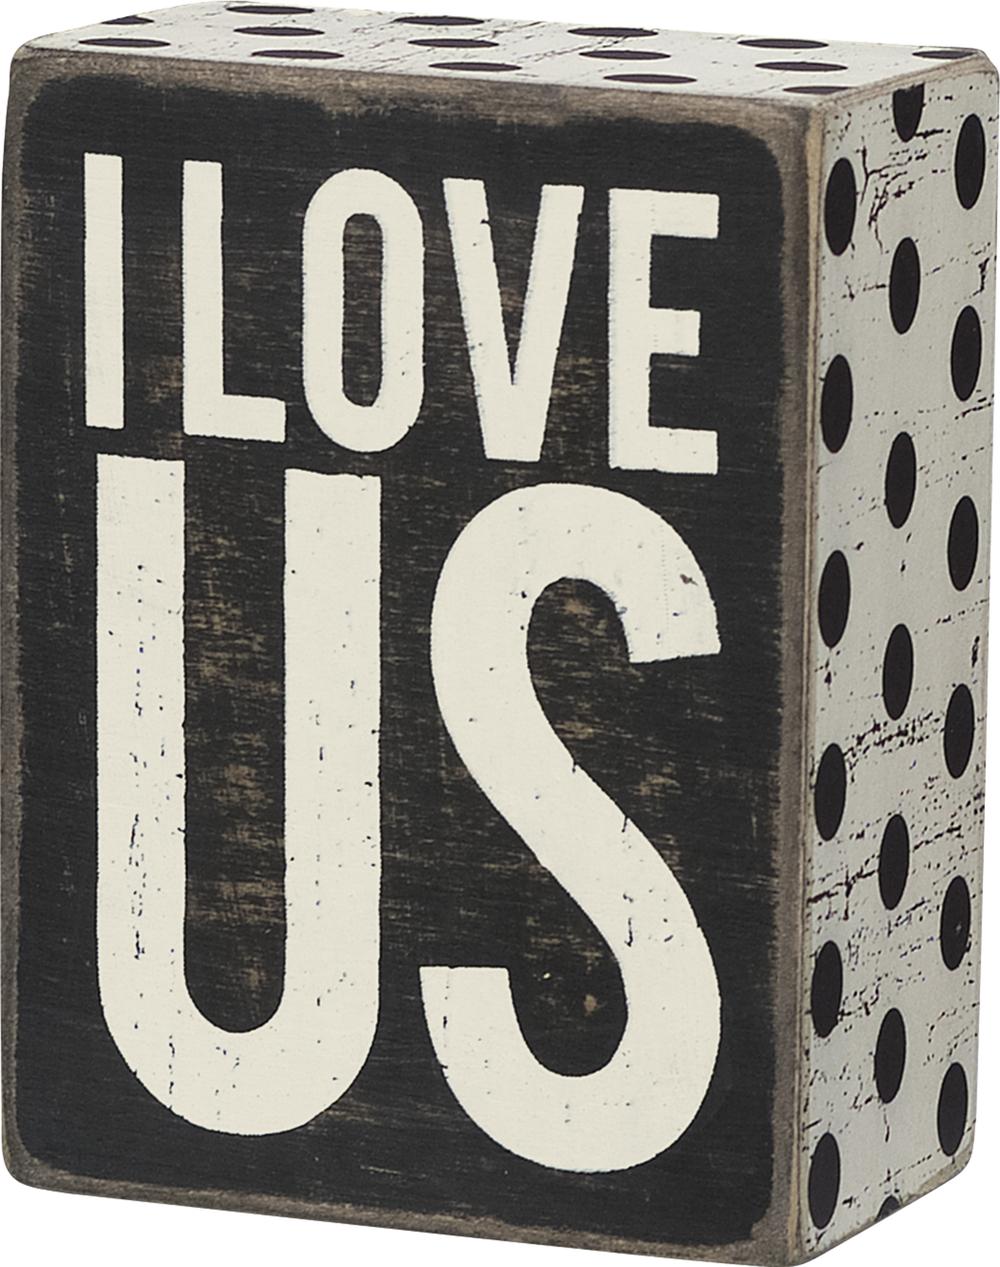 I LOVE US' BOX SIGN $9